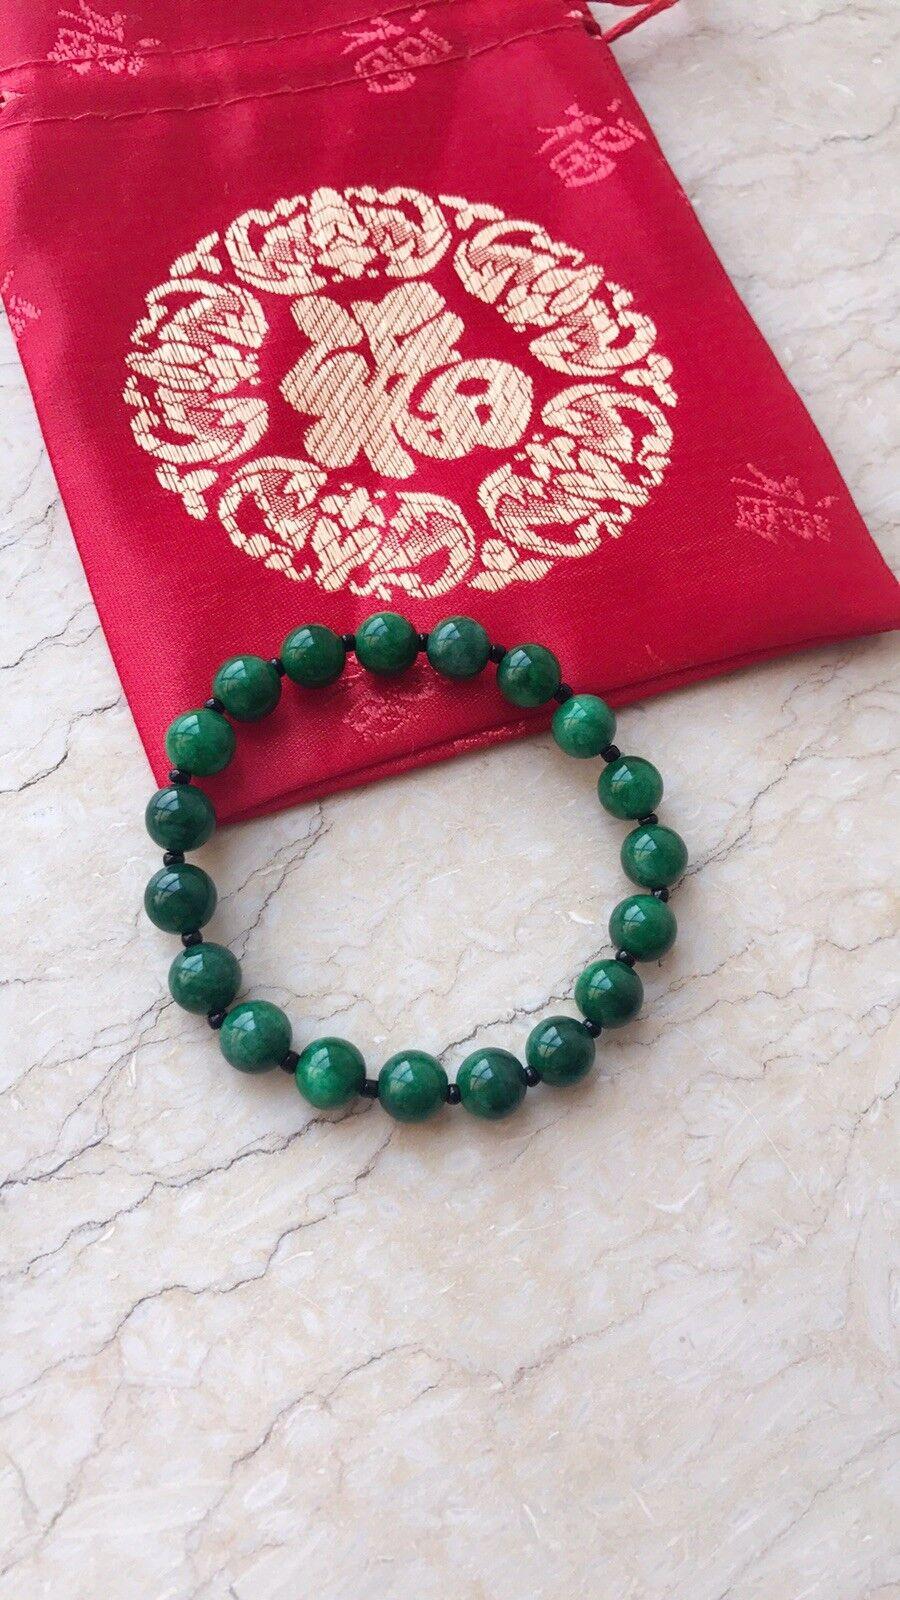 Brand New Auth Dark Green Jade Beads Bracelets With Silk Pouch